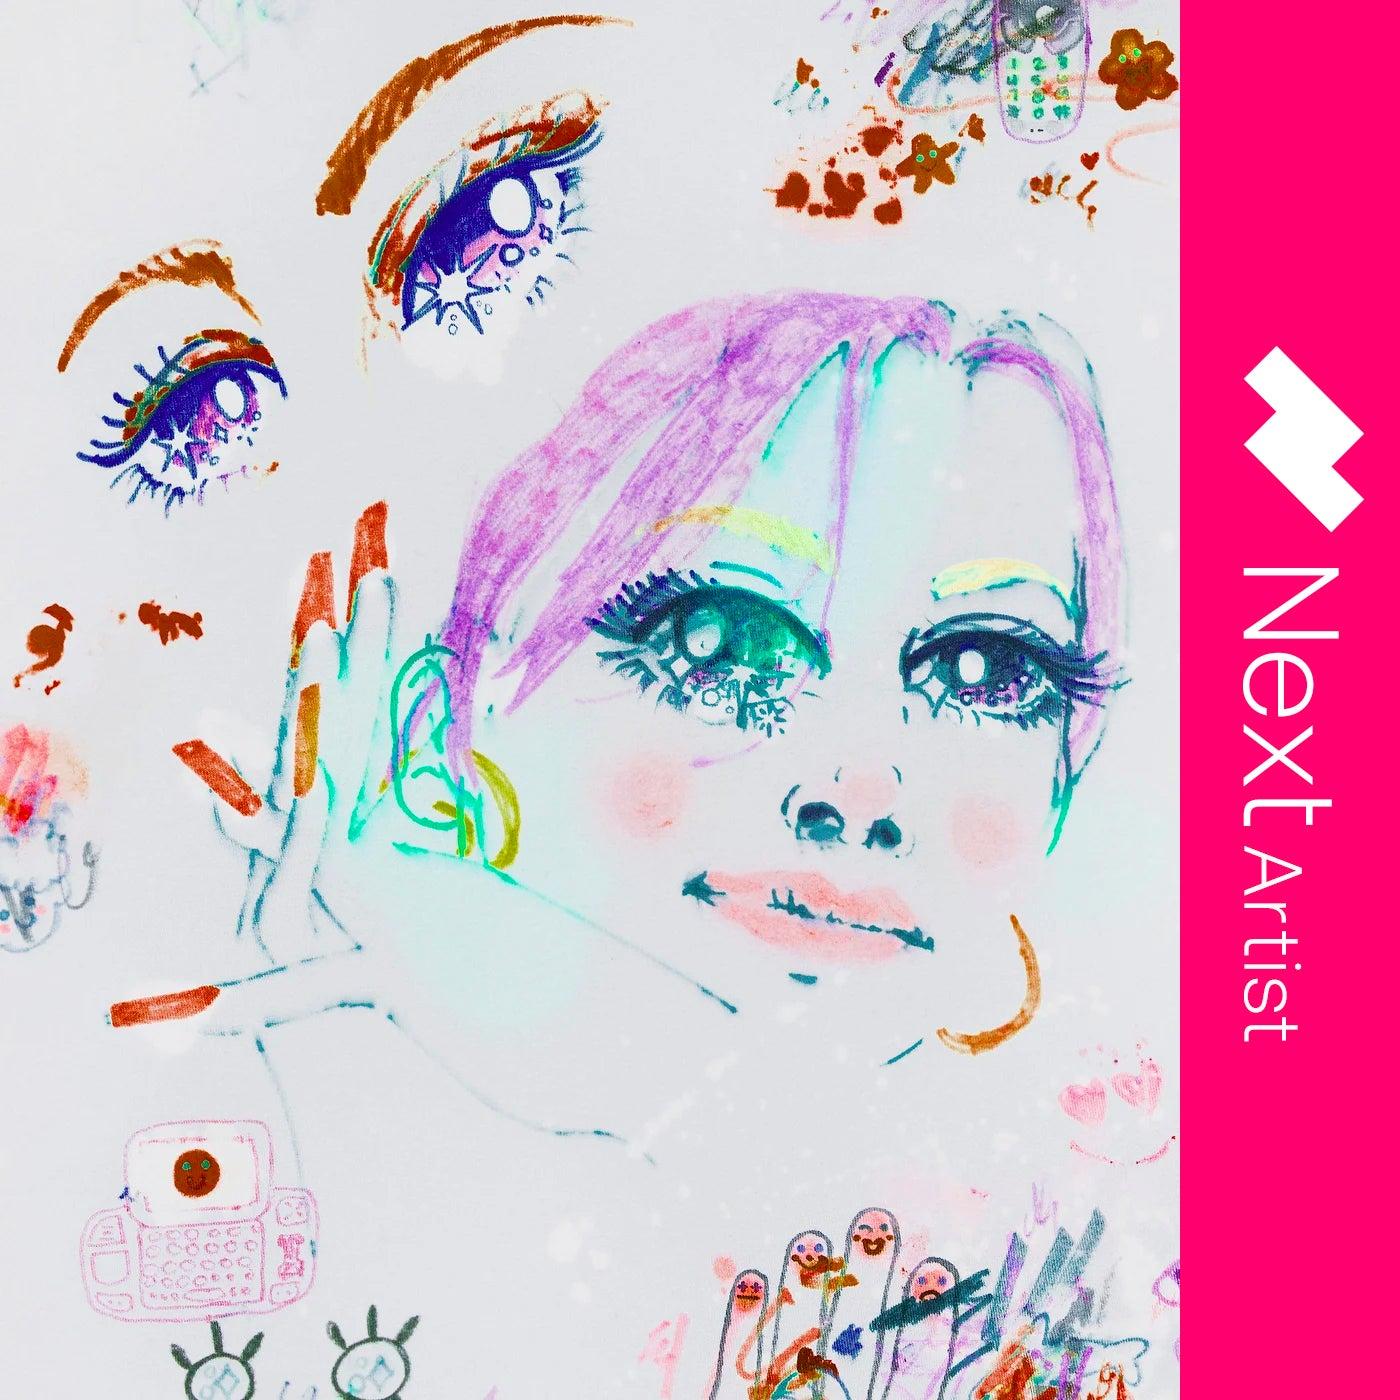 Like My Way (Original Mix)